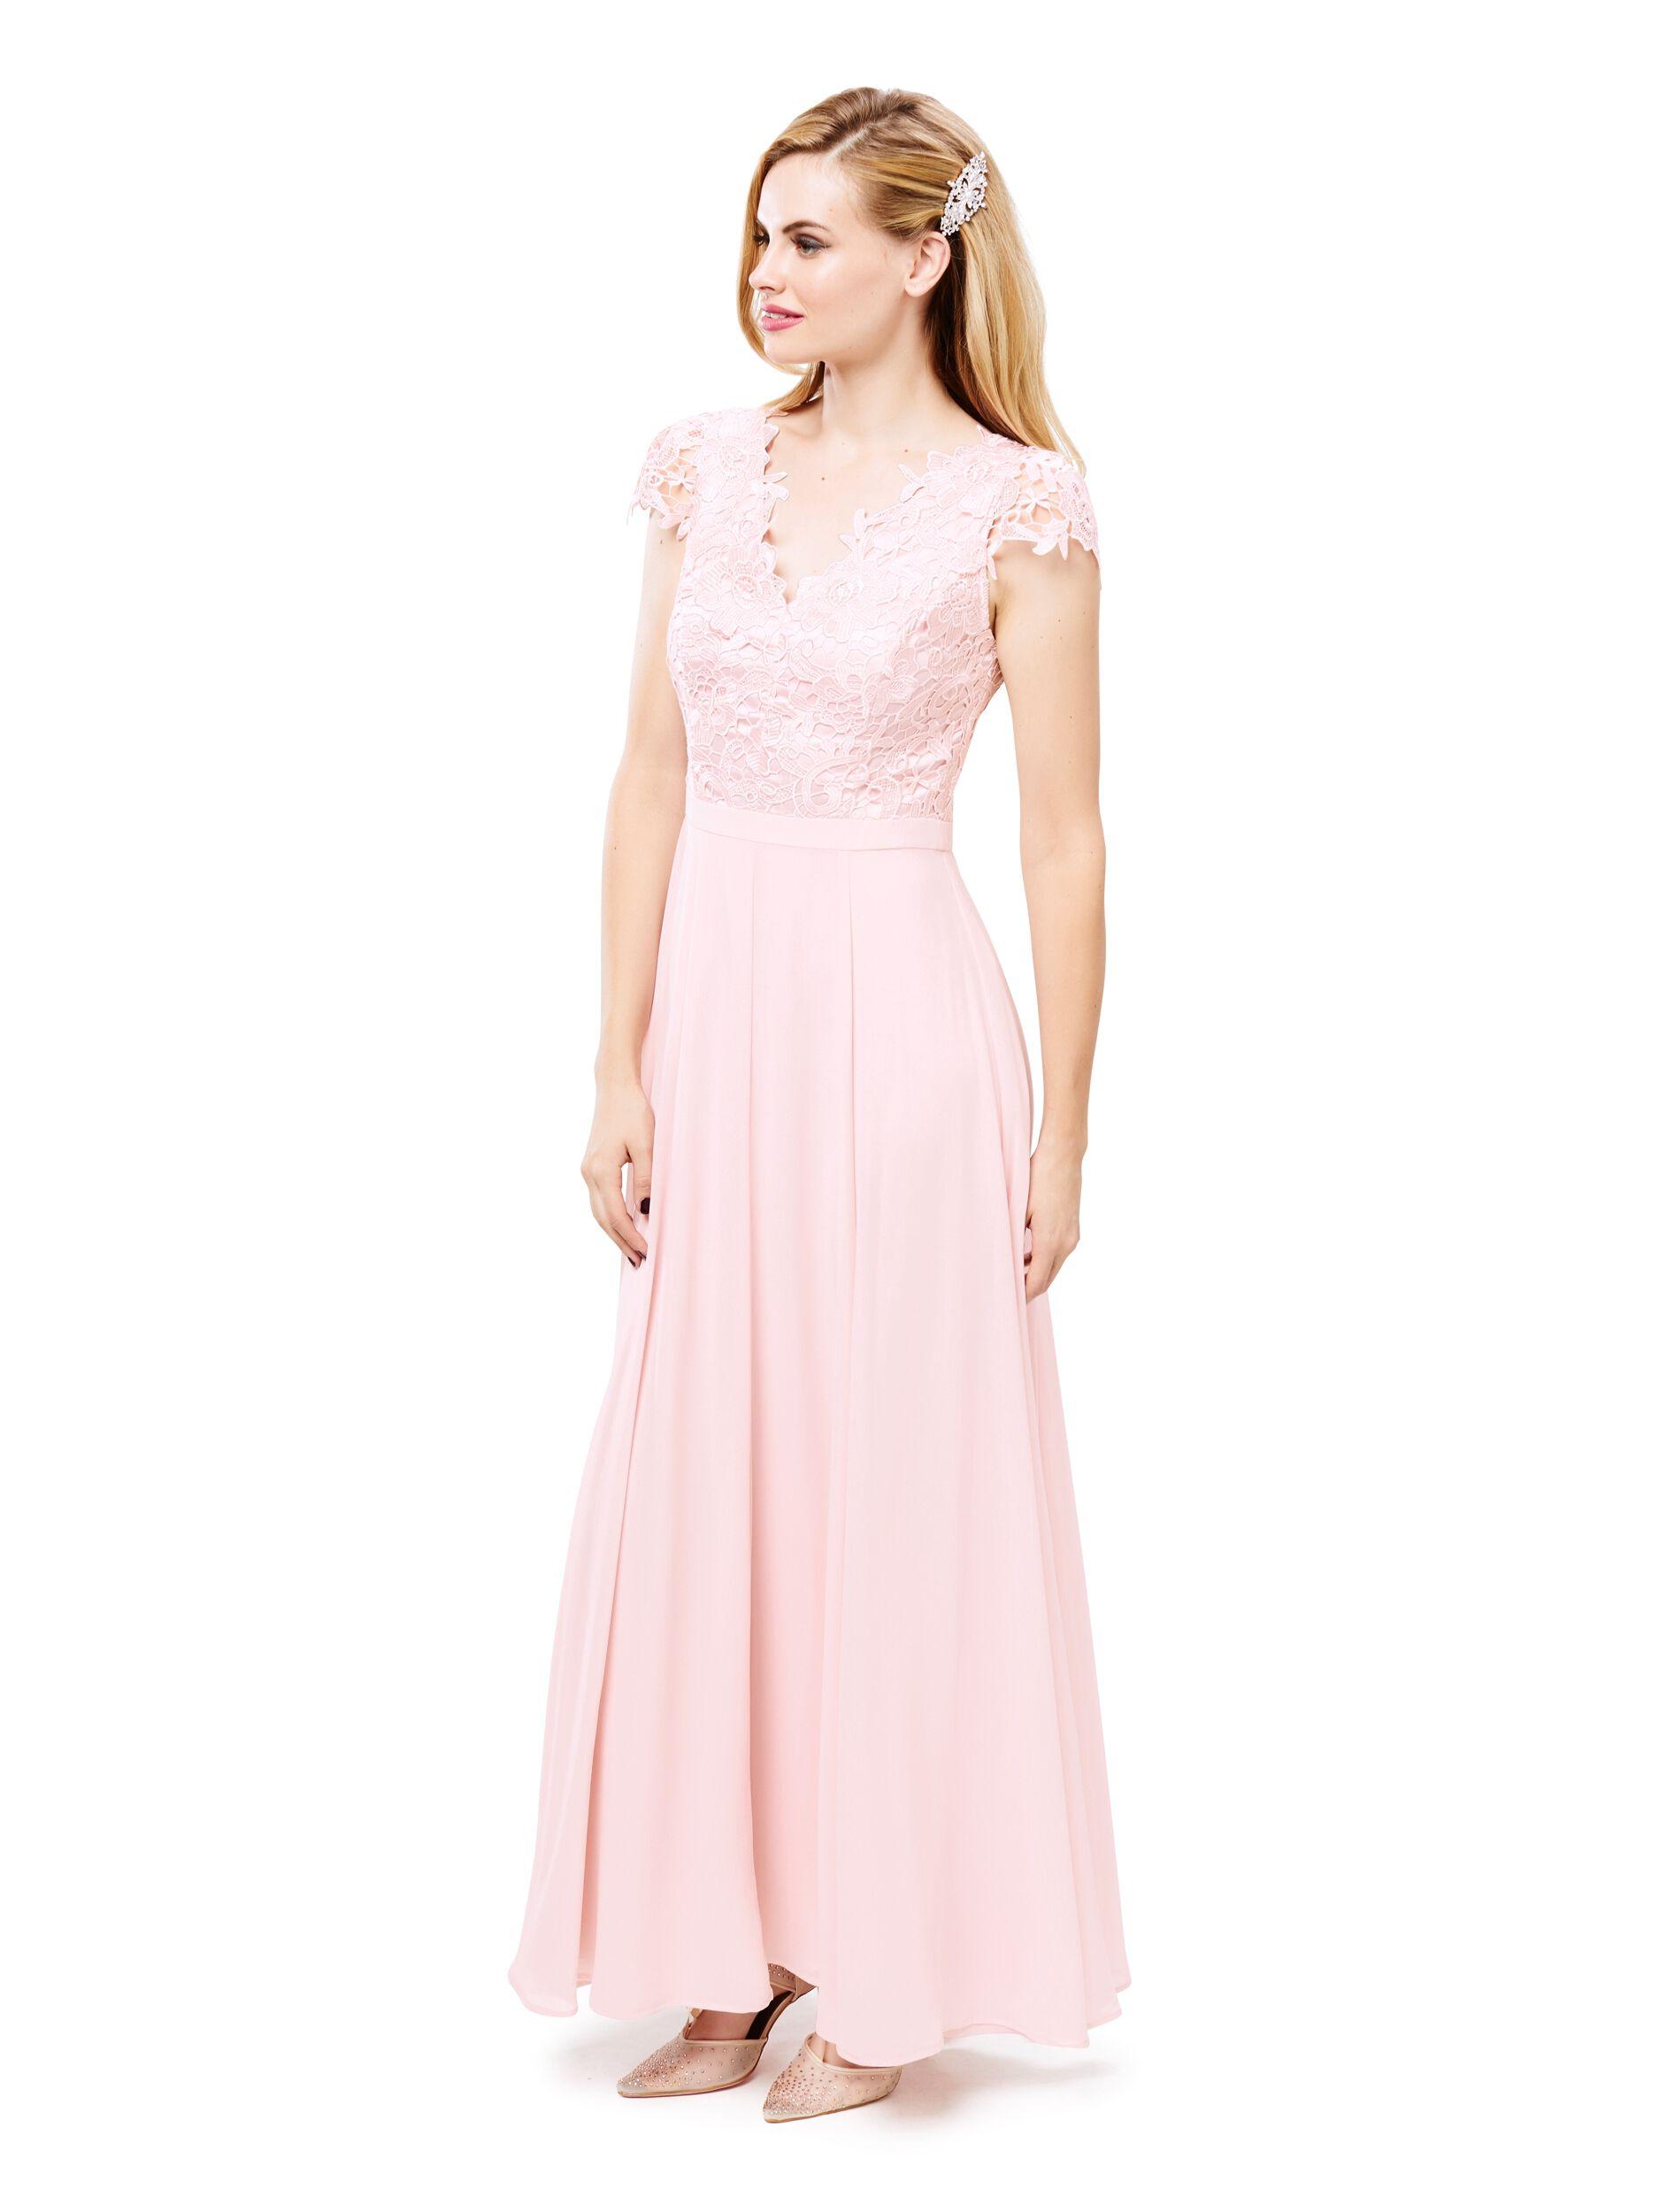 Endless Romance Maxi Dress